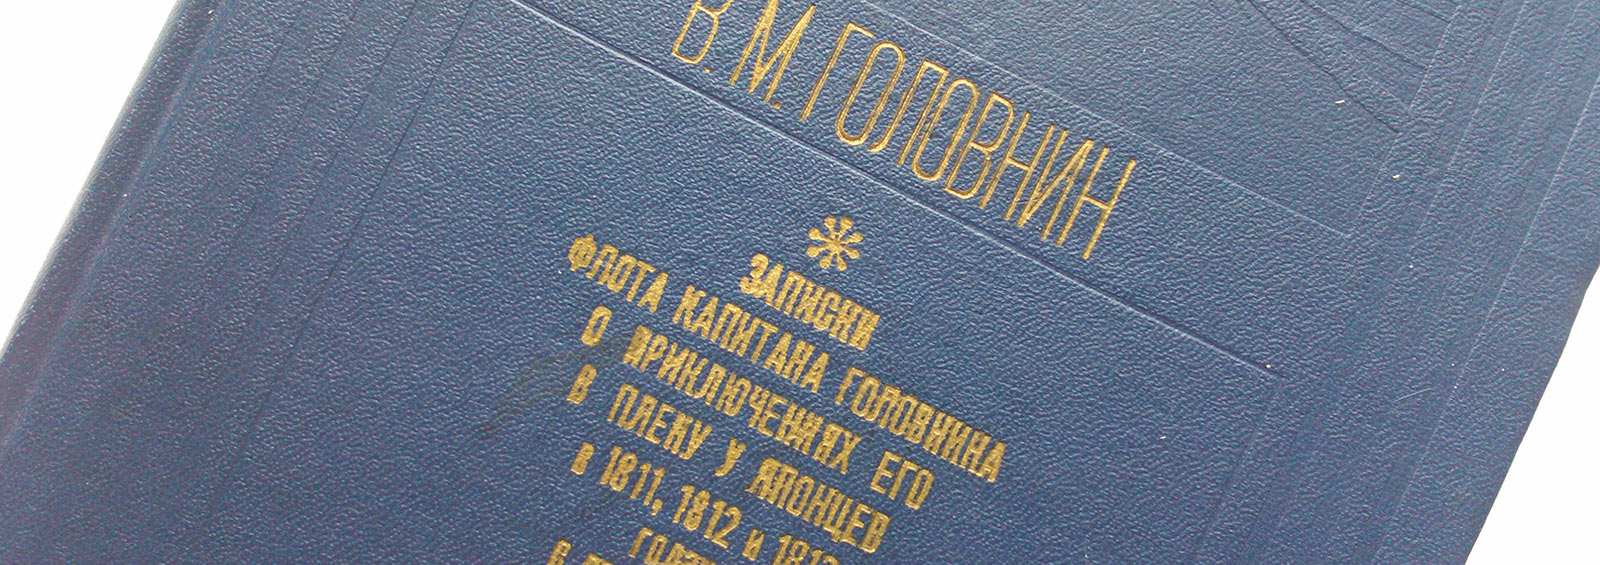 головнин, книга, записки флота офицера